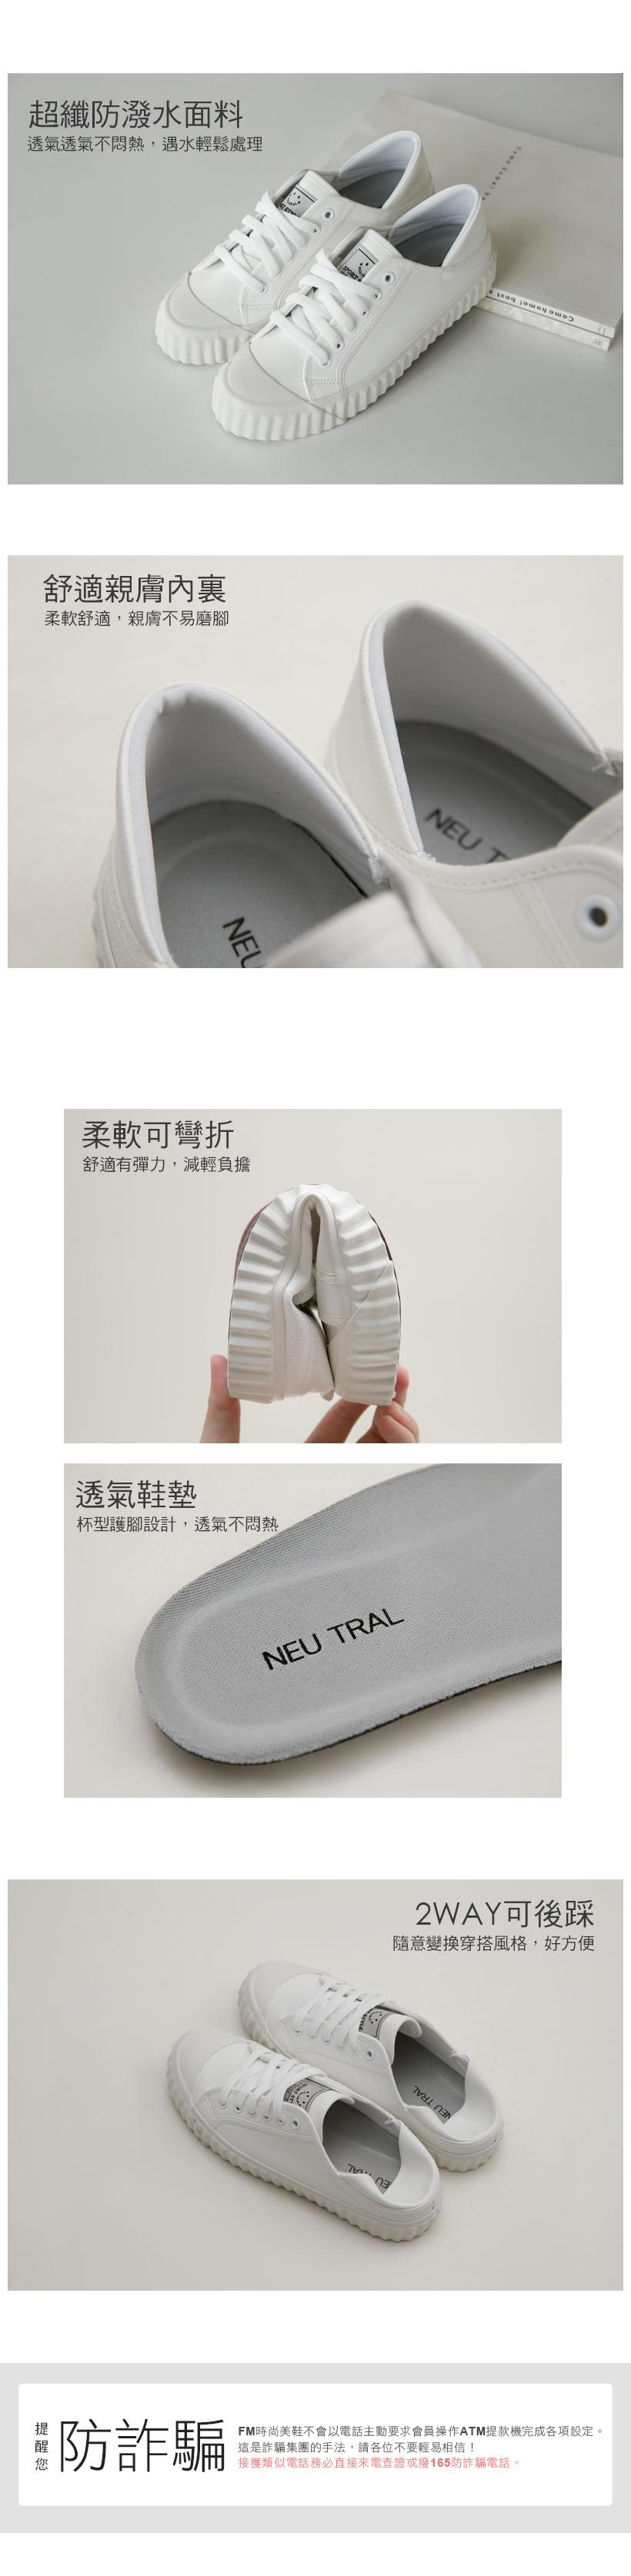 NeuTral-2way防潑水後踩餅乾鞋(白)-大尺碼